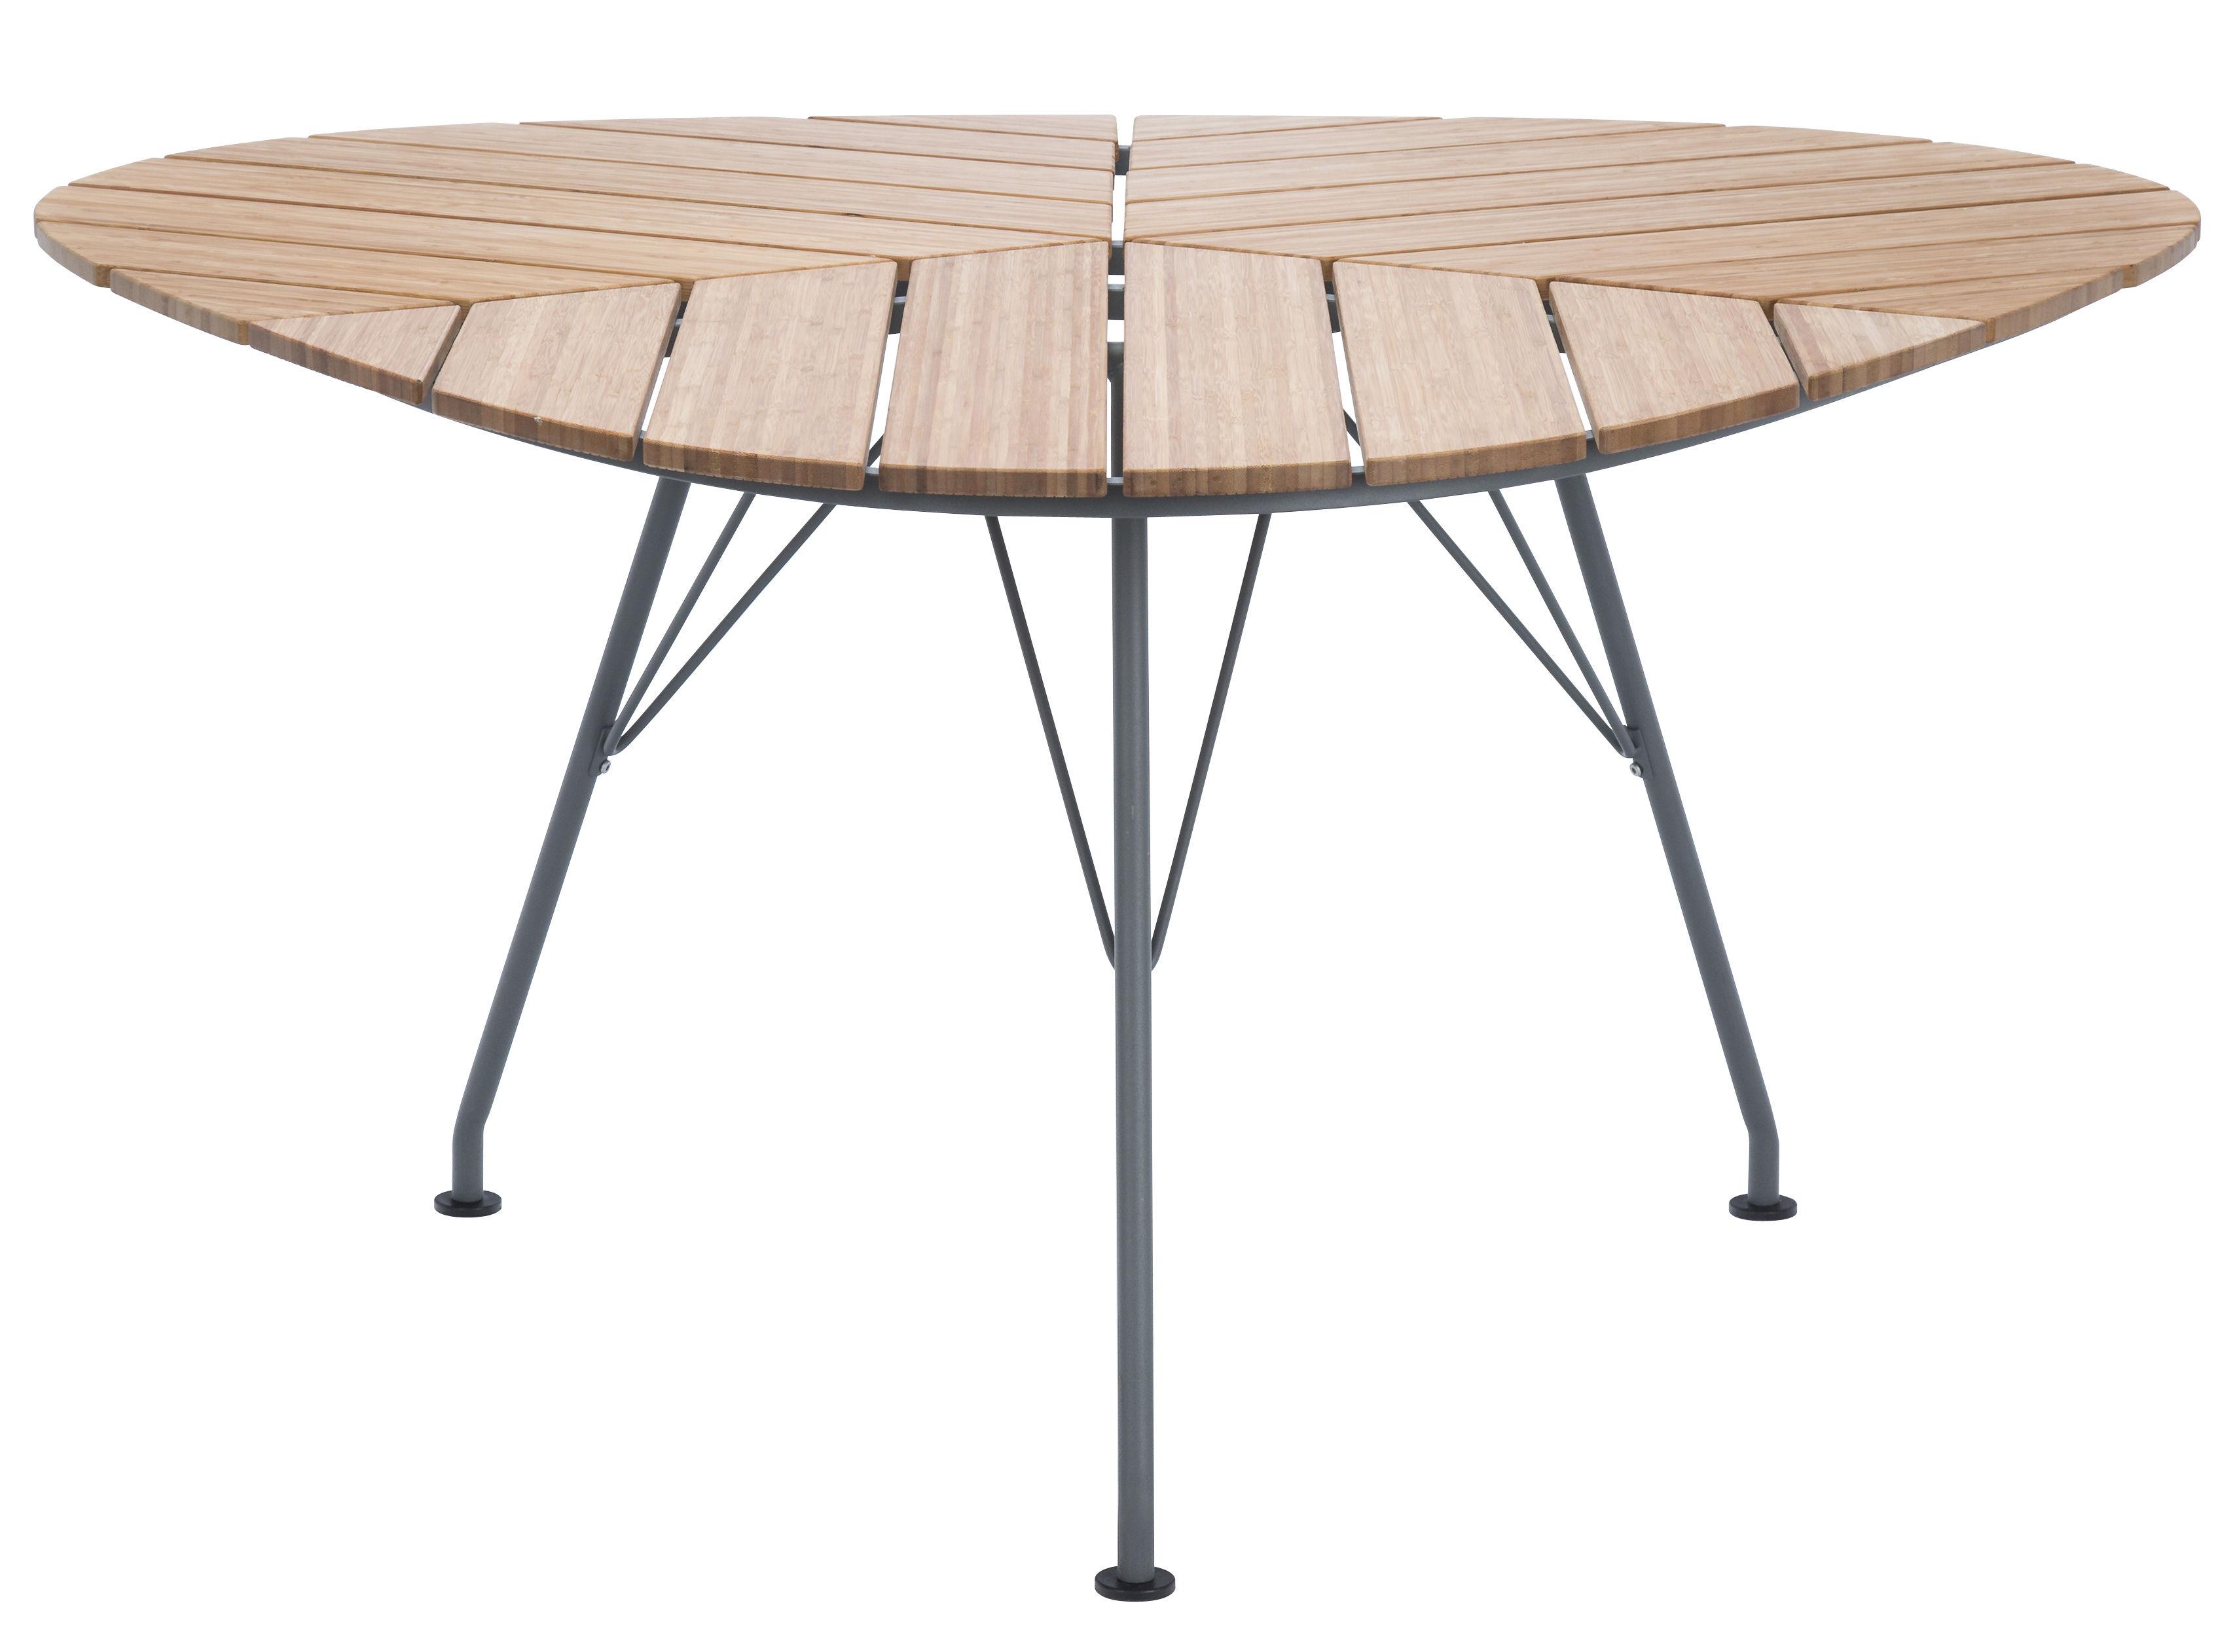 leaf tavolo da giardino bamb triangolare 146 x 146 x 146 cm bamb base grigio by houe. Black Bedroom Furniture Sets. Home Design Ideas